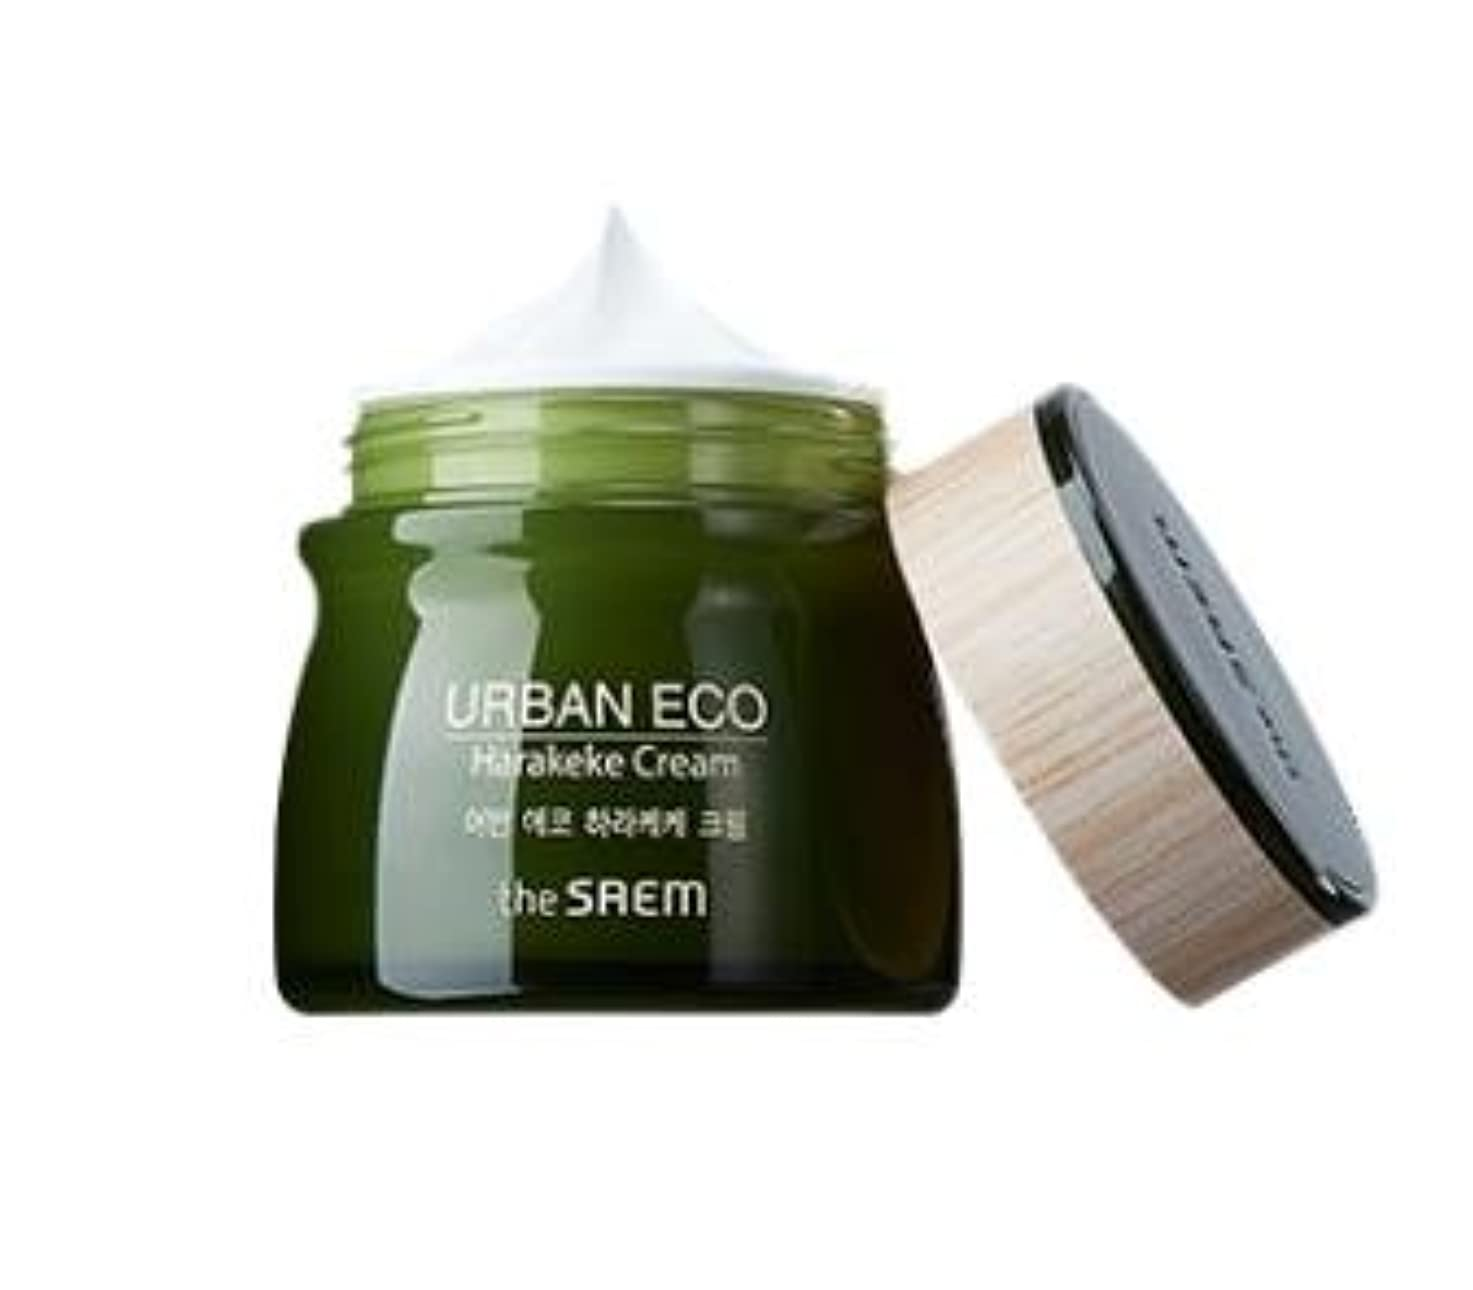 [NEW]The Saem Urban Eco Harakeke Cream ザセム アーバンエコ ハラケケクリーム [並行輸入品]